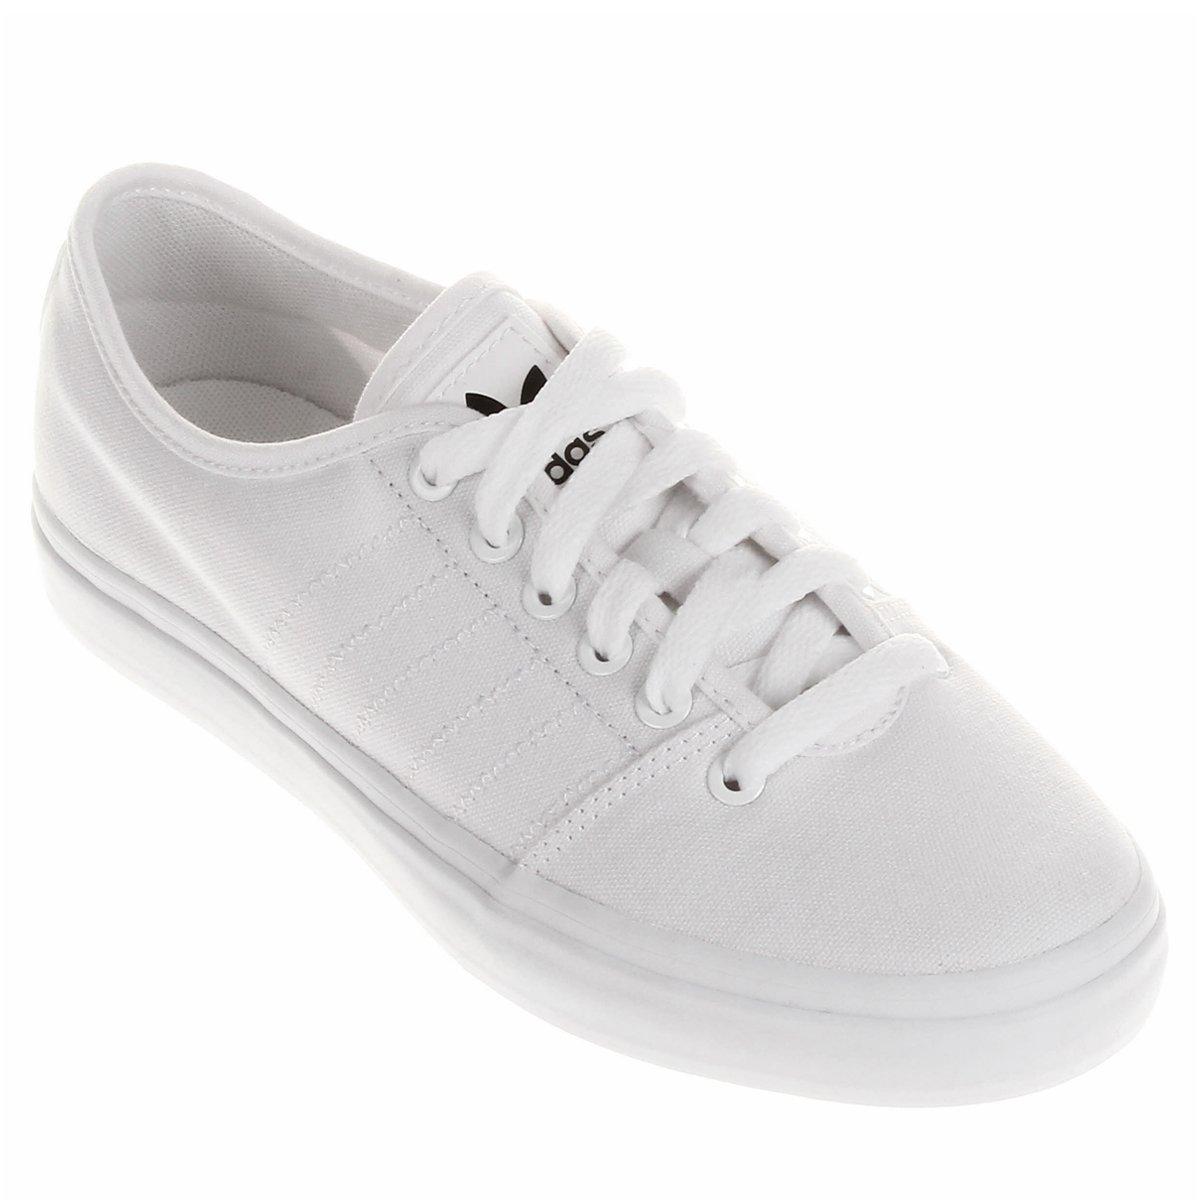 Tenis Adidas Adria Low compre Agora Netshoes